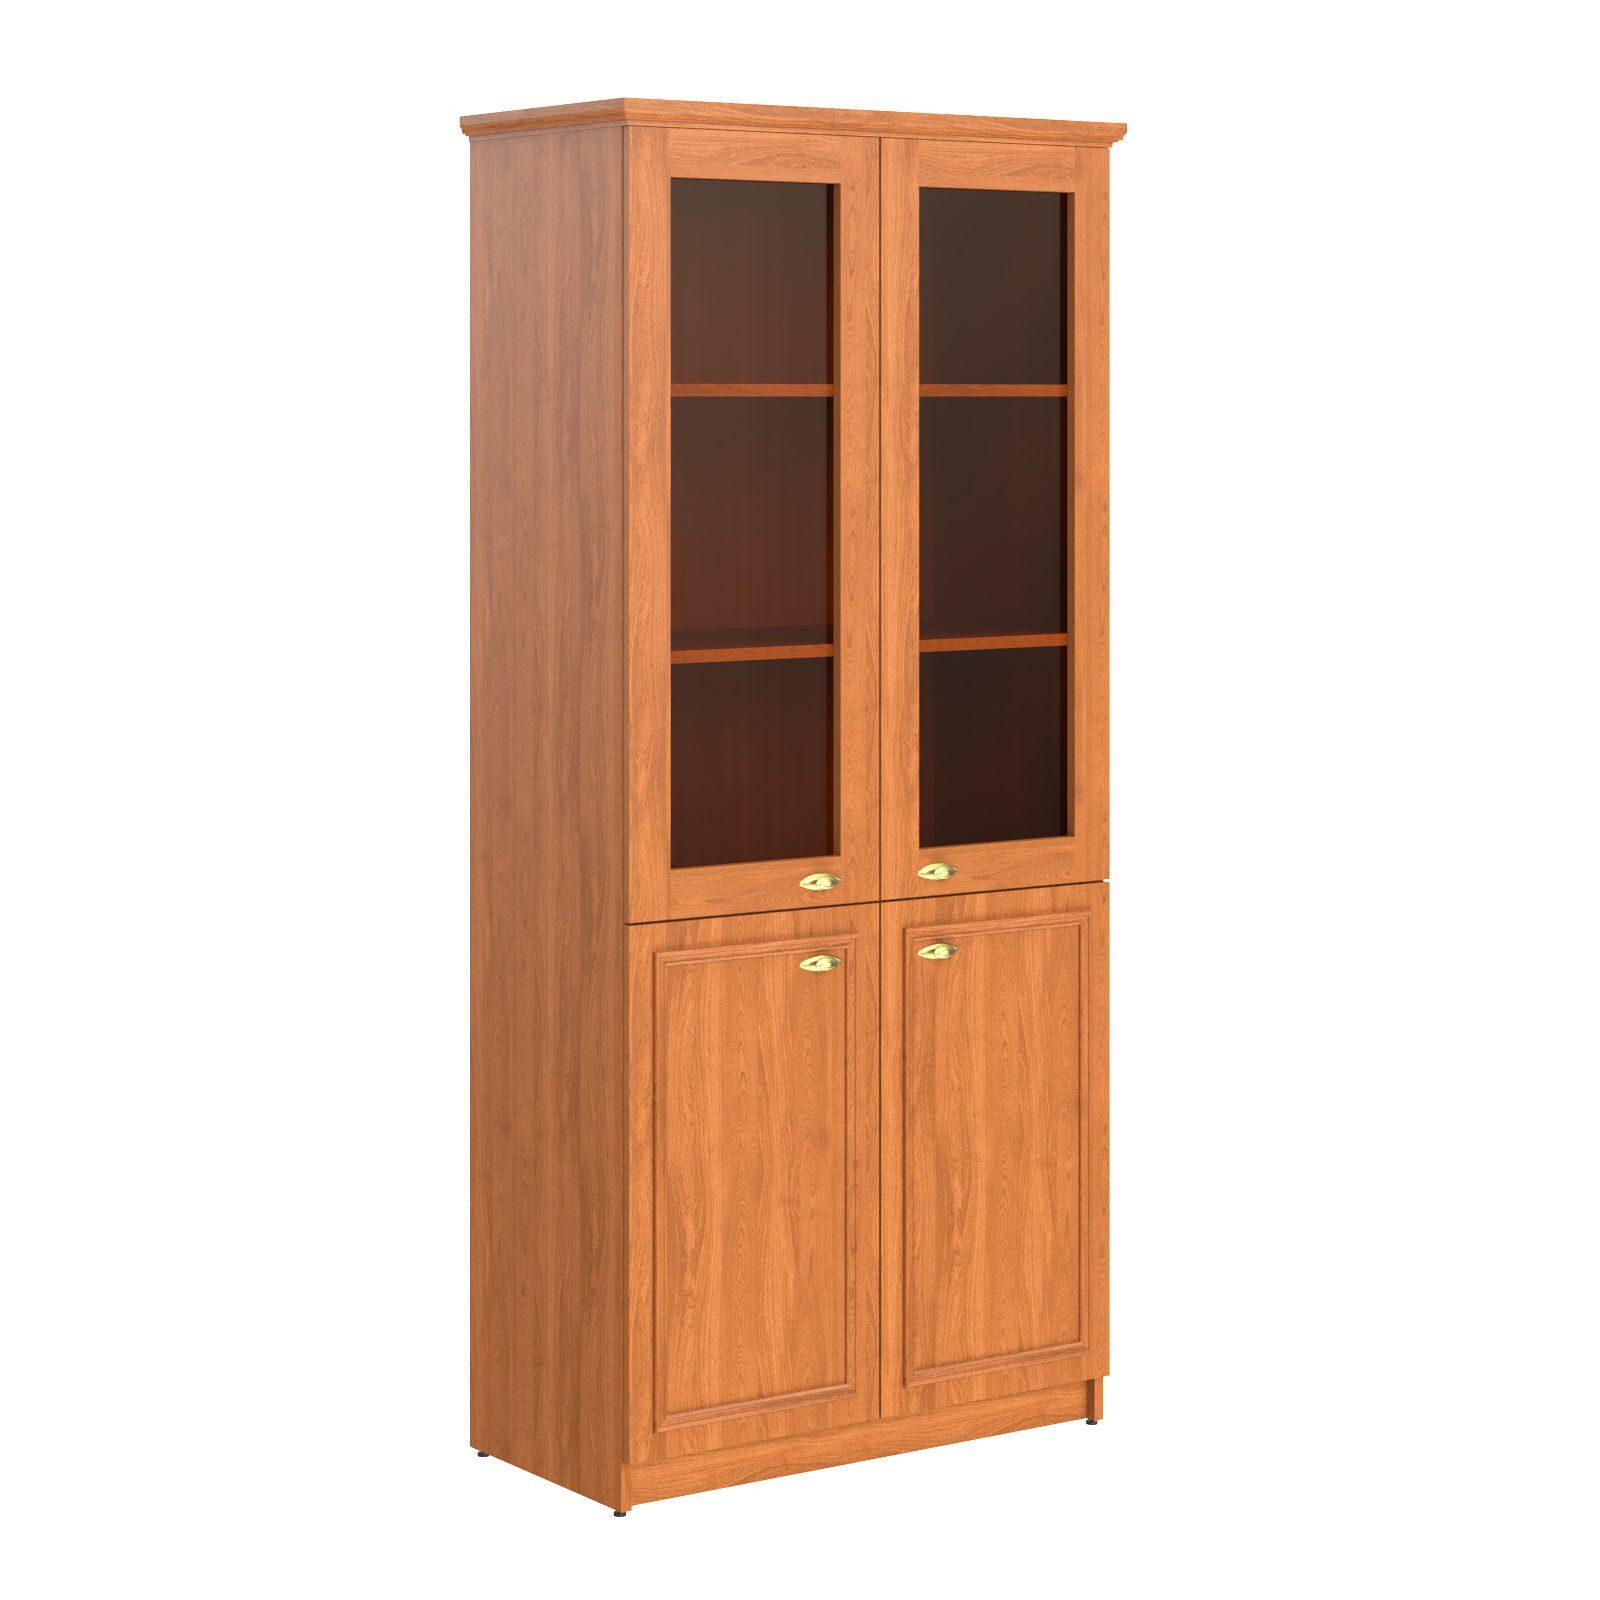 Шкаф со стеклом rhc 89.2 922х466х2023.